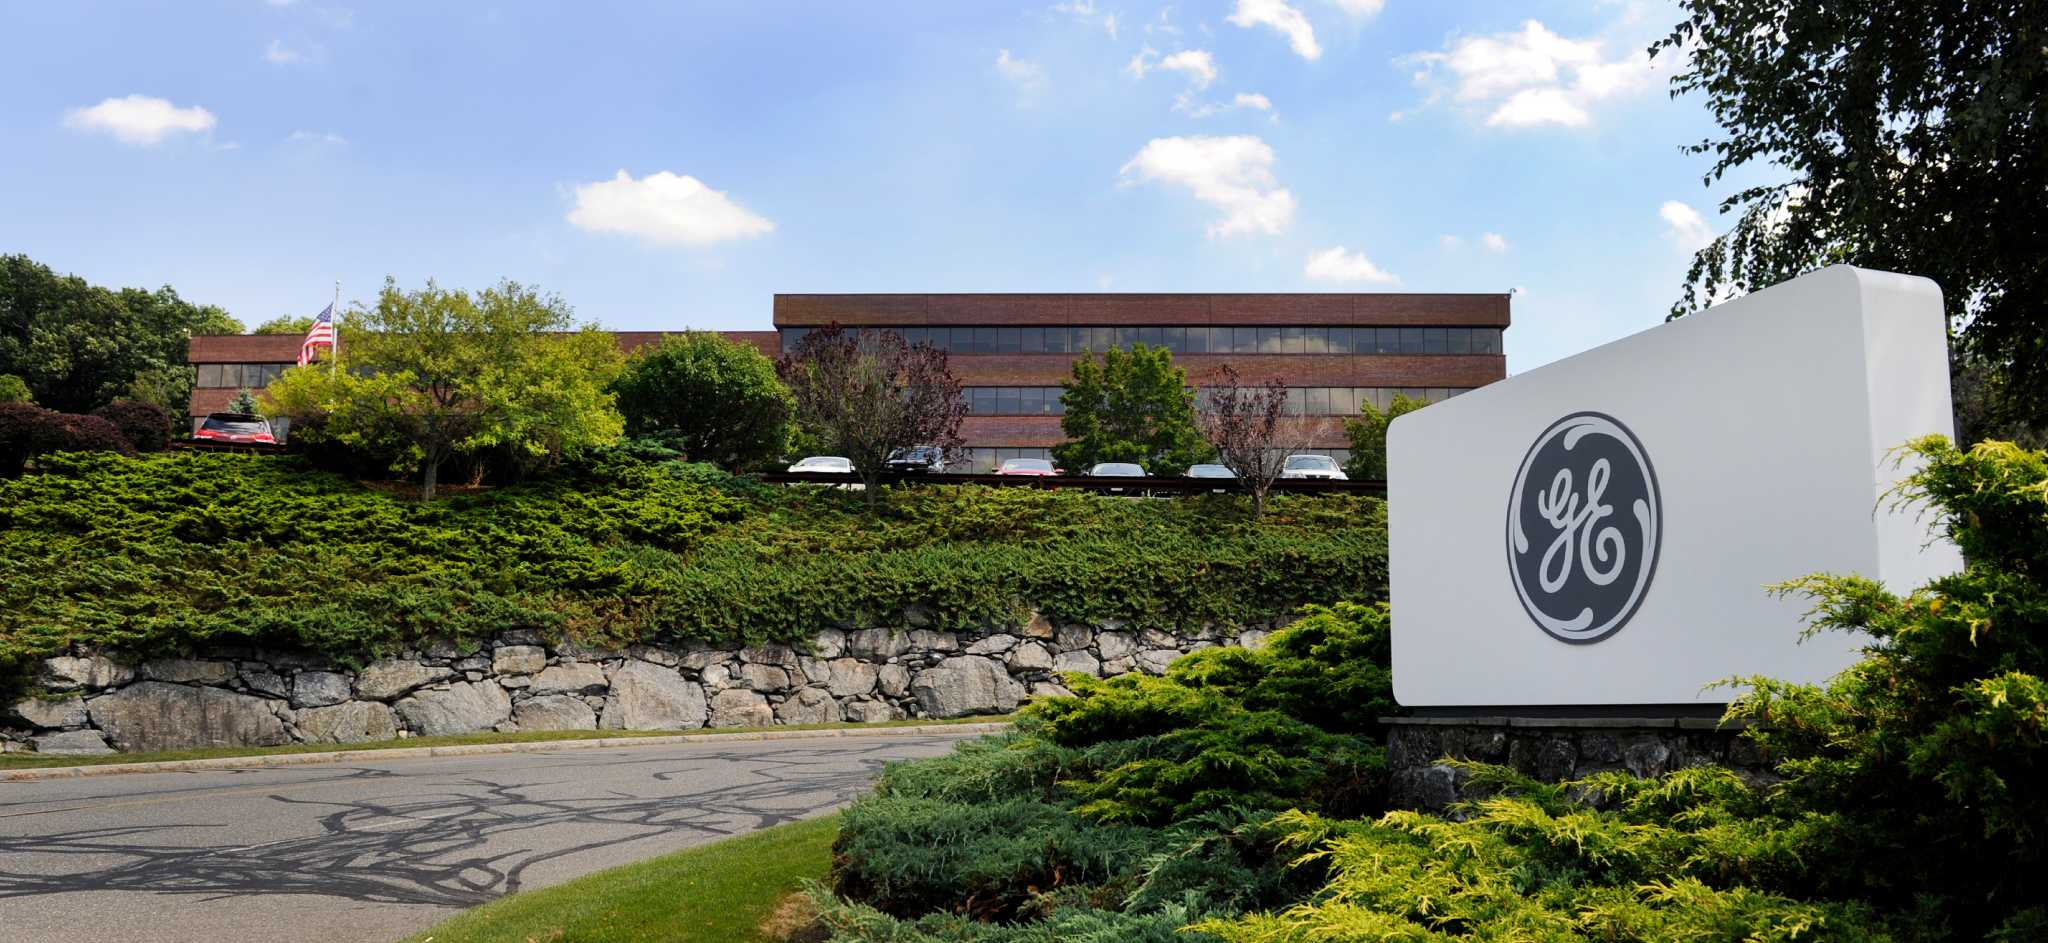 Praxair Buys Ge Building In Danbury For 20m Newstimes